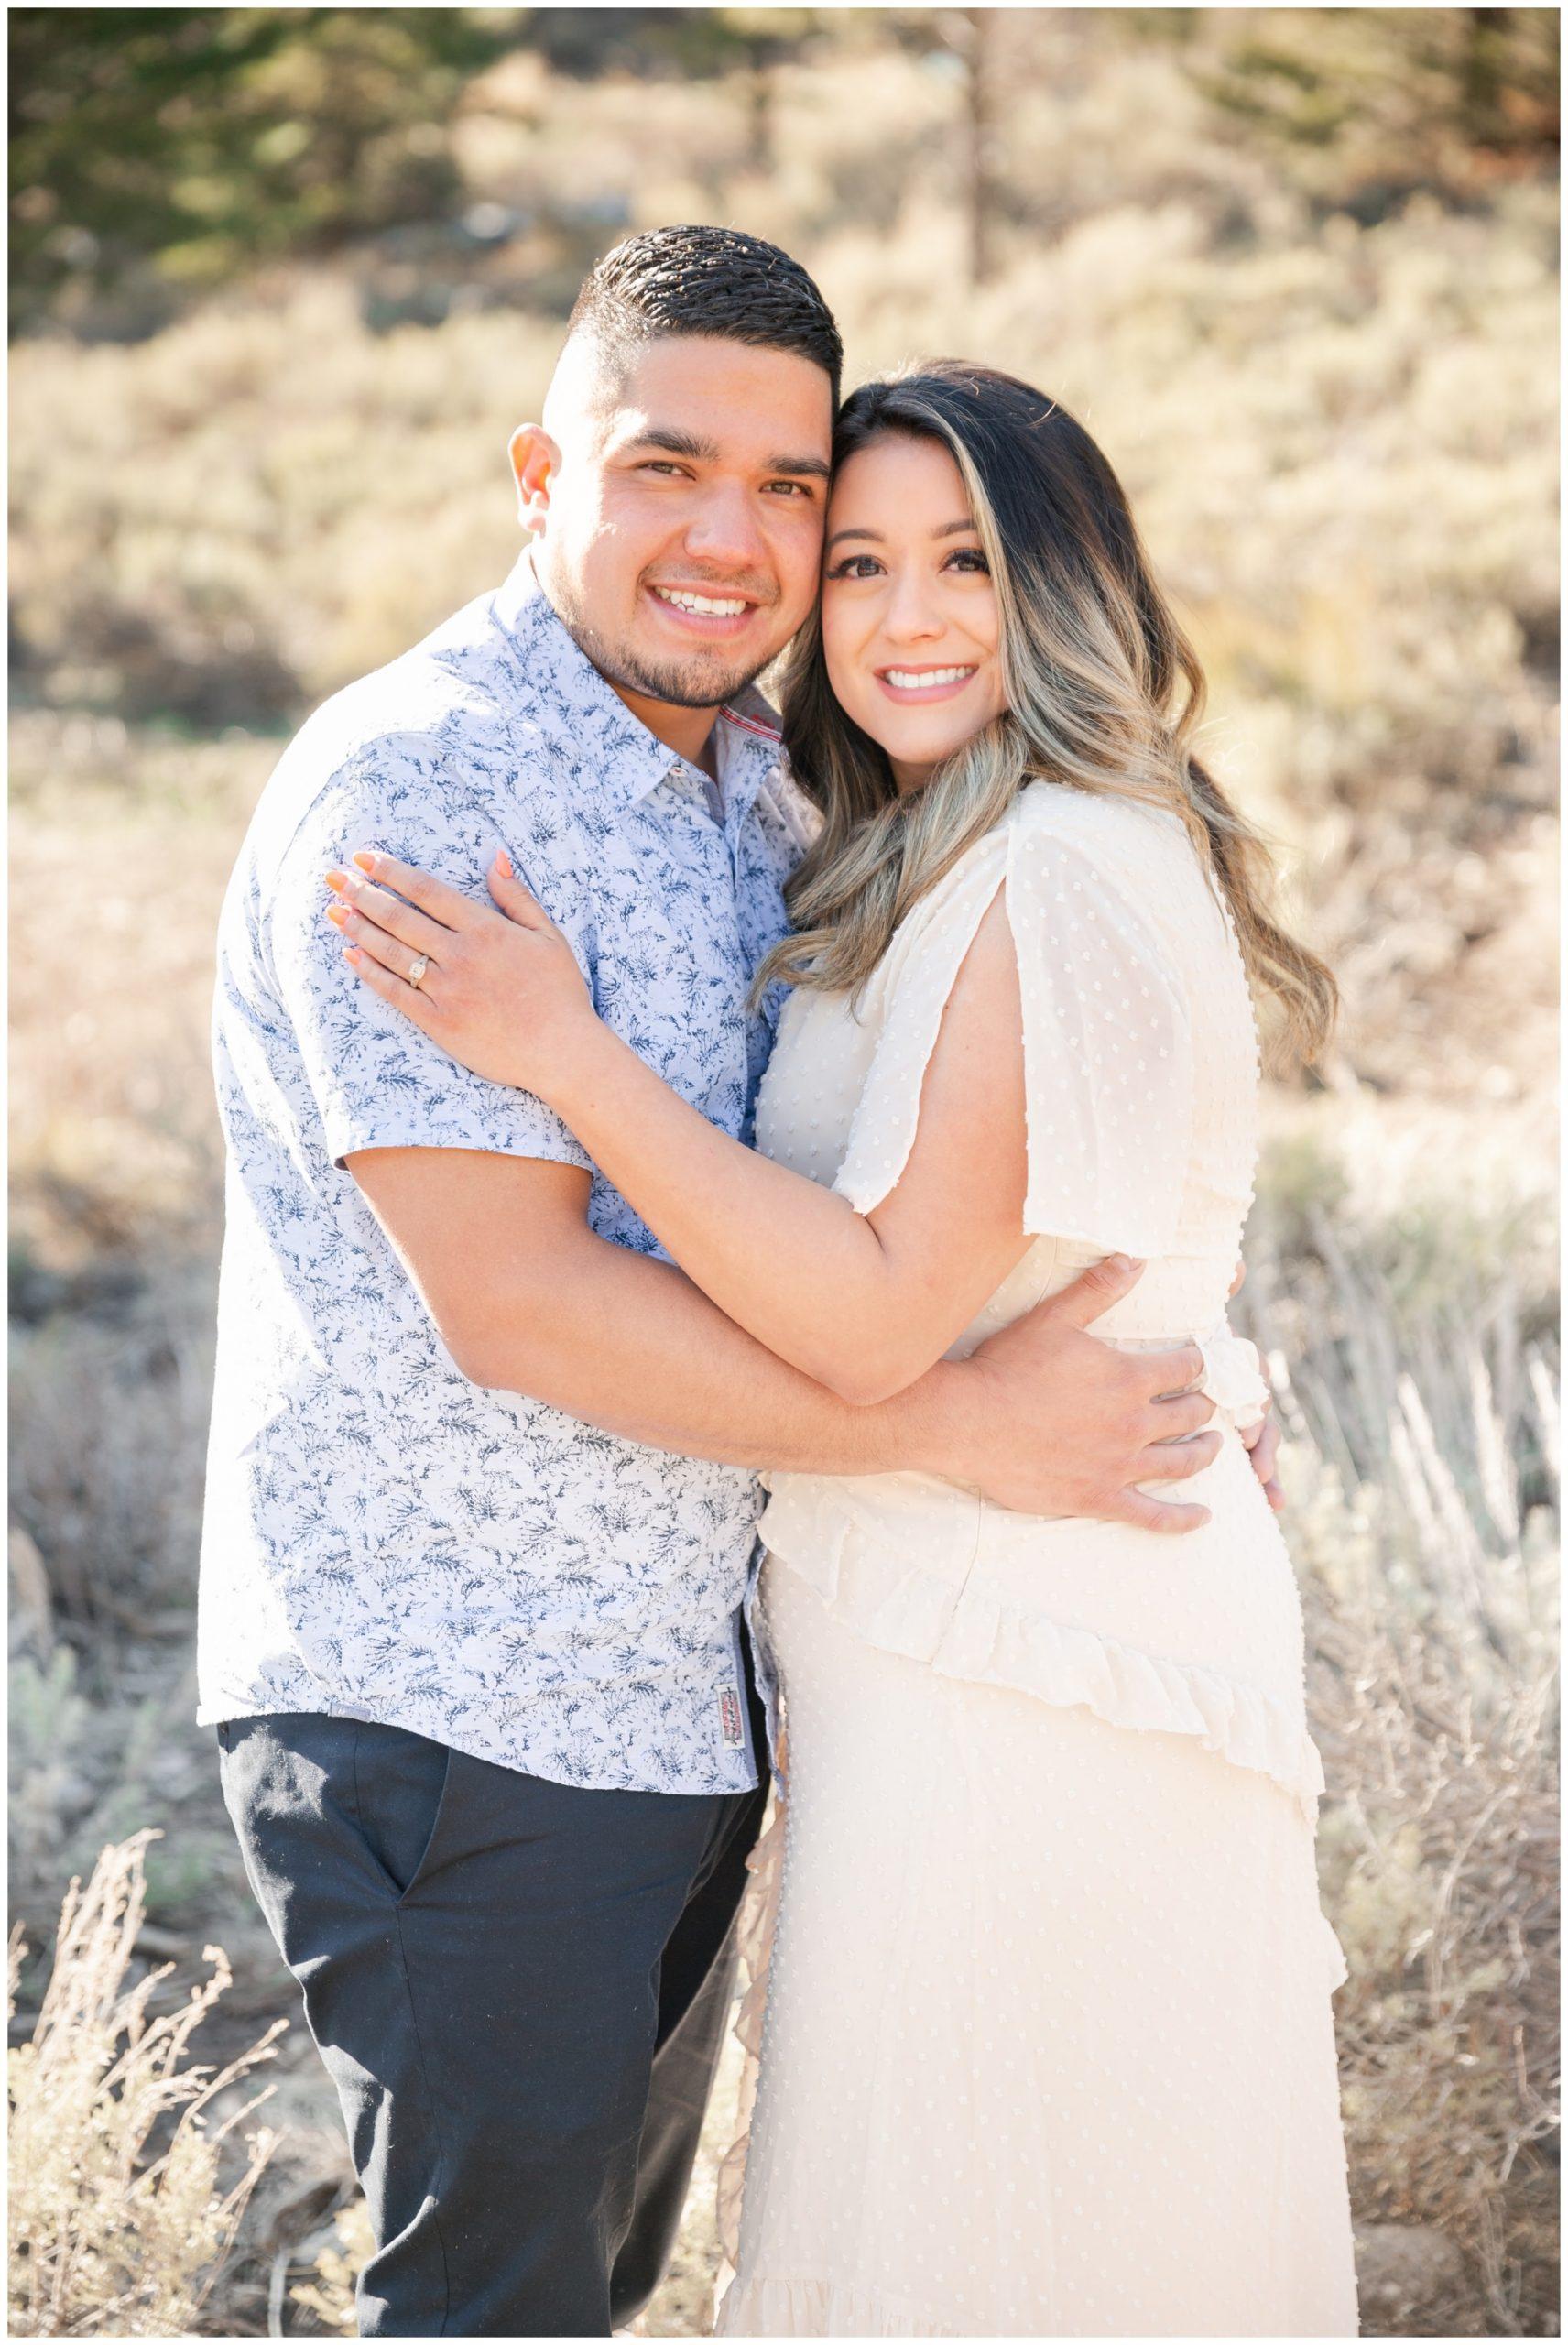 Engagement poses for utah photographers